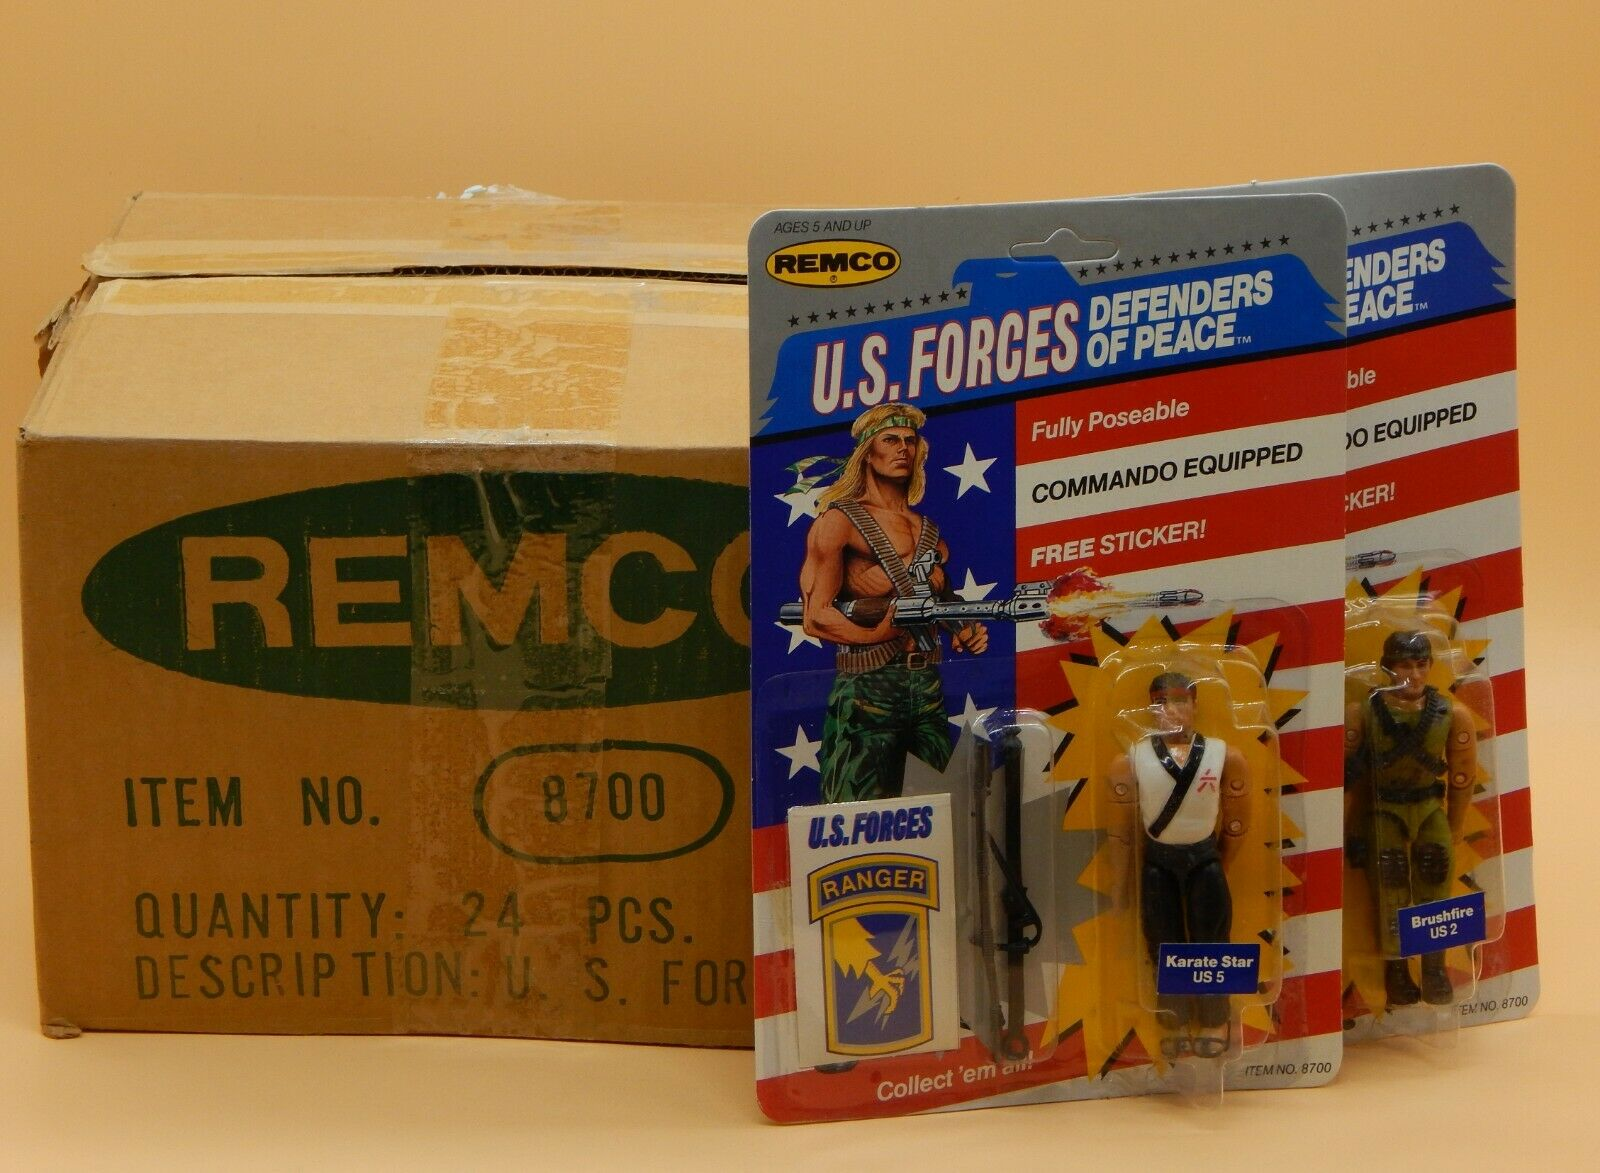 1986 vintage U.S. FORCES Brushfire & Karate Star MOC Remco  w  shipping BOX wow